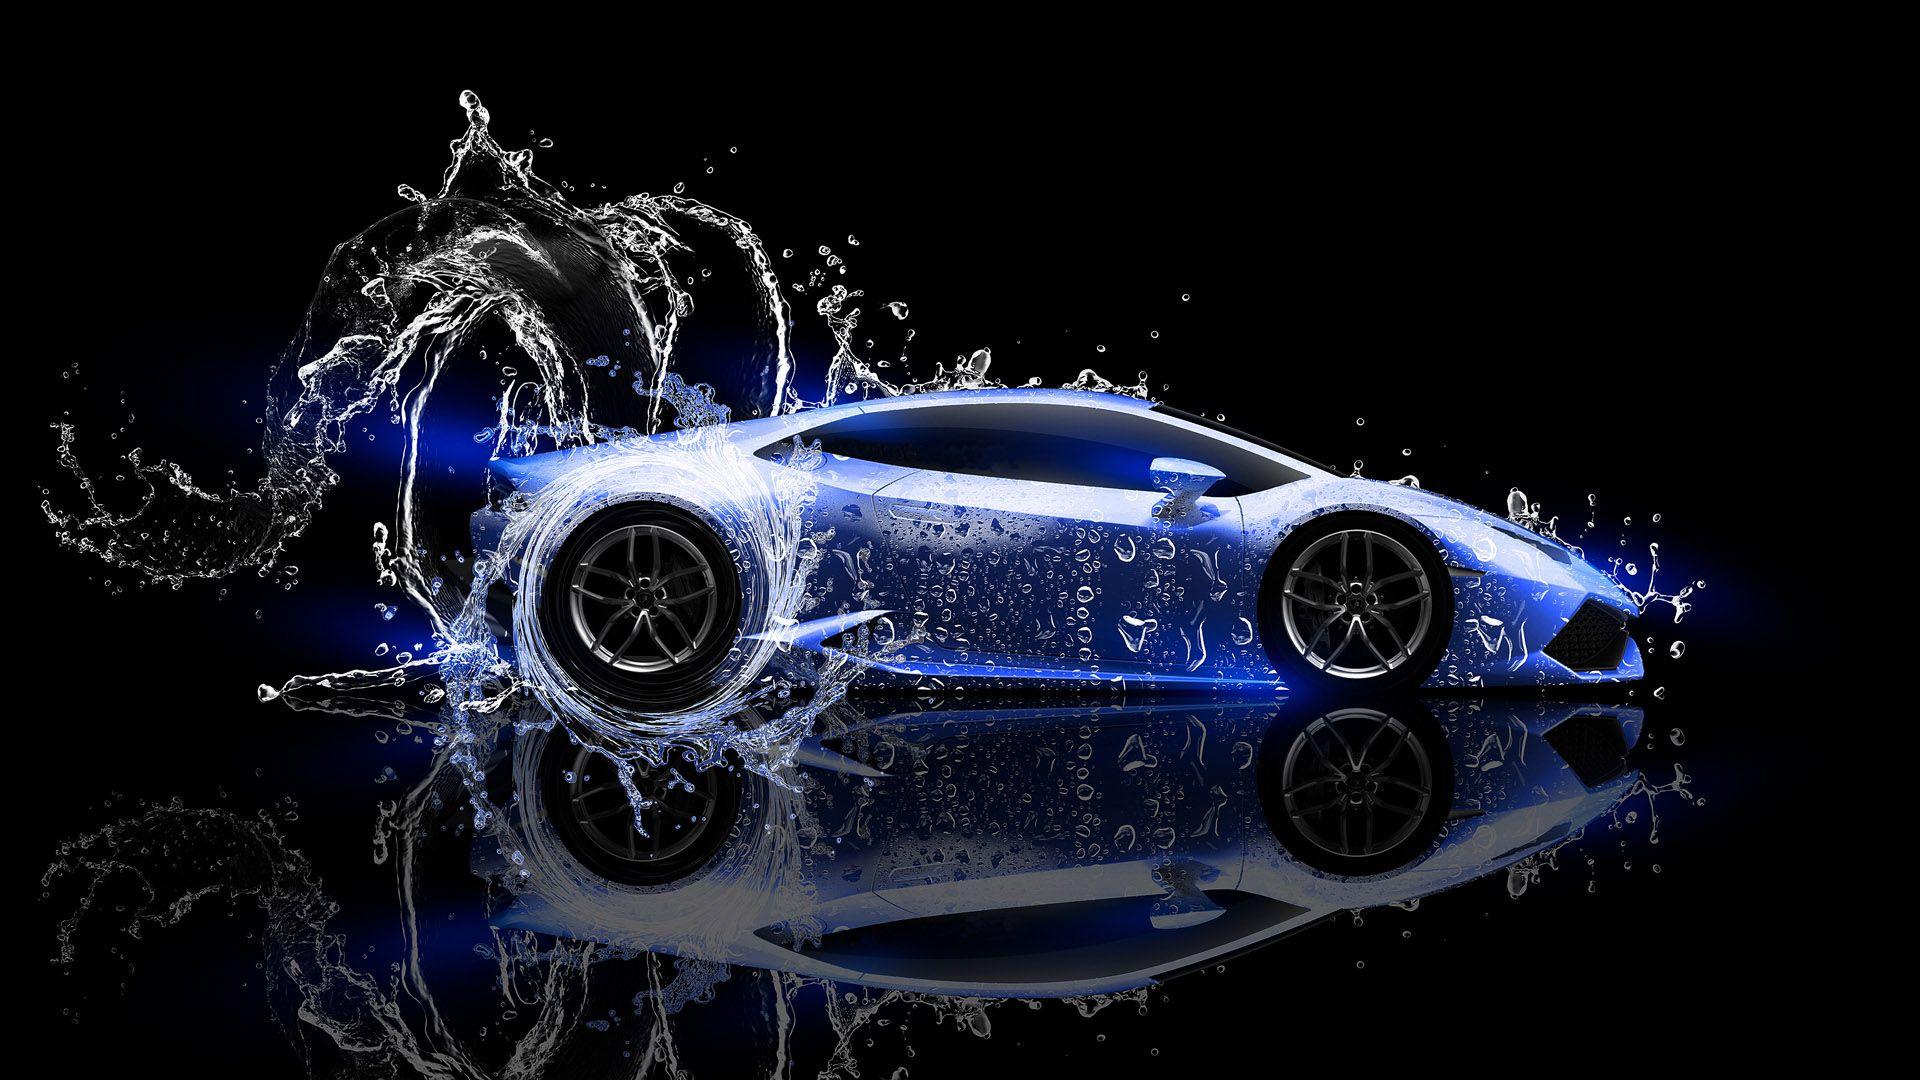 Attractive Lamborghini Huracan Tuning Front Water Car 2014   Lamborghini Huracan  Fantasy Plastic Bull Car Huracan Tuning Front Crystal City Car IPhone X Back  Logo ...